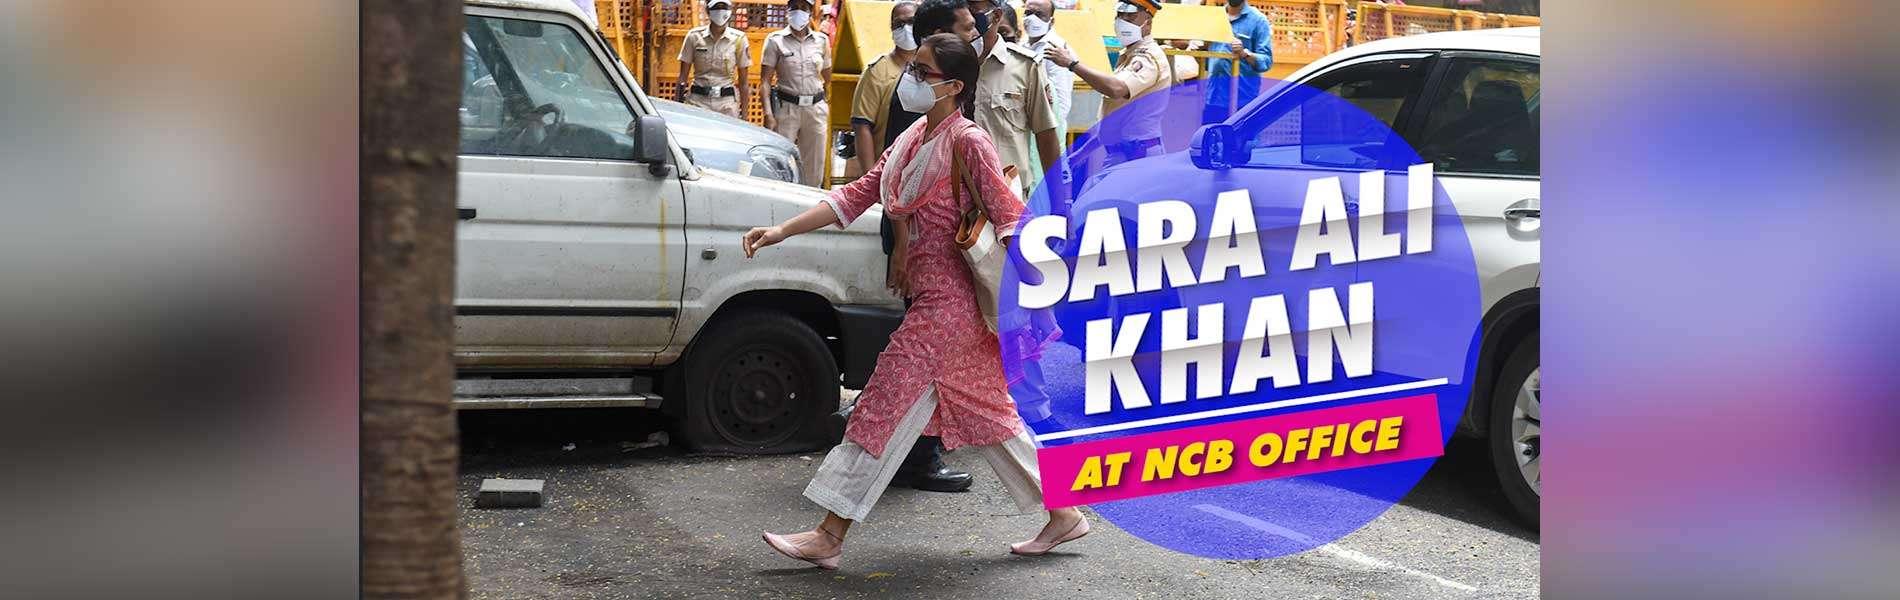 sara-ali-khan-arrives-at-ncb-office